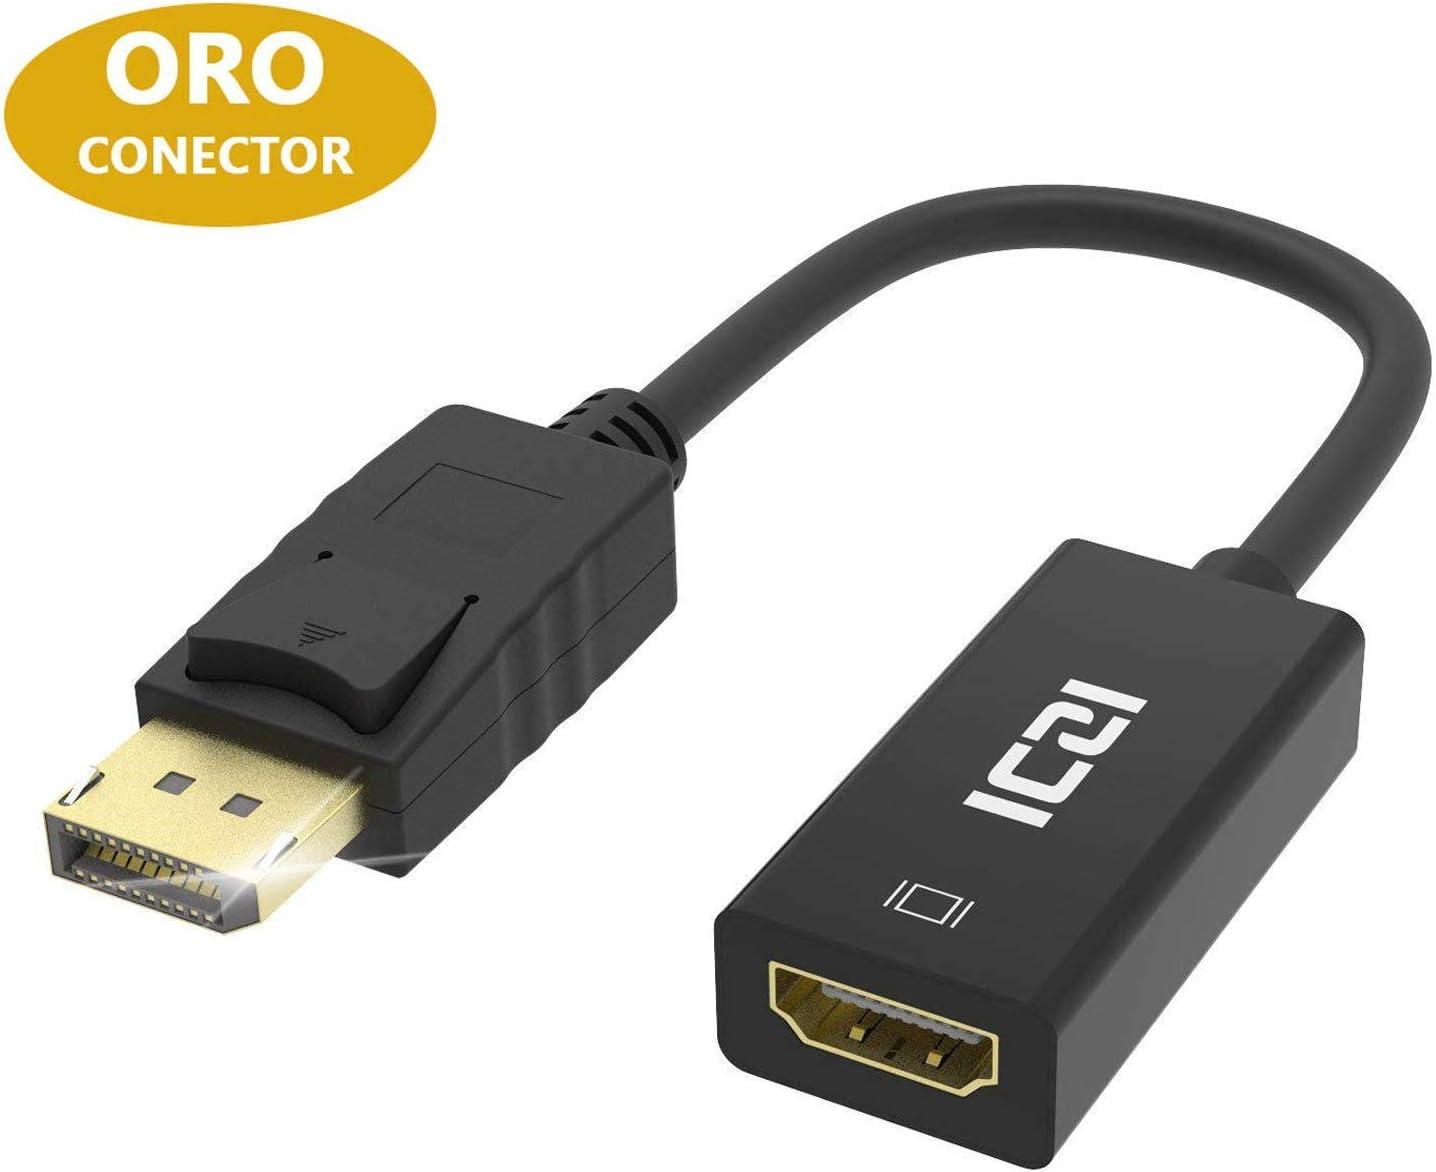 ICZI Adaptador DisplayPort to HDMI 1080P Conversor DP a HDMI con Contactos Chapados en Oro, DP Macho a HDMI Hembra para Pantallas Monitores HDTV Proyectores, etc, Negro